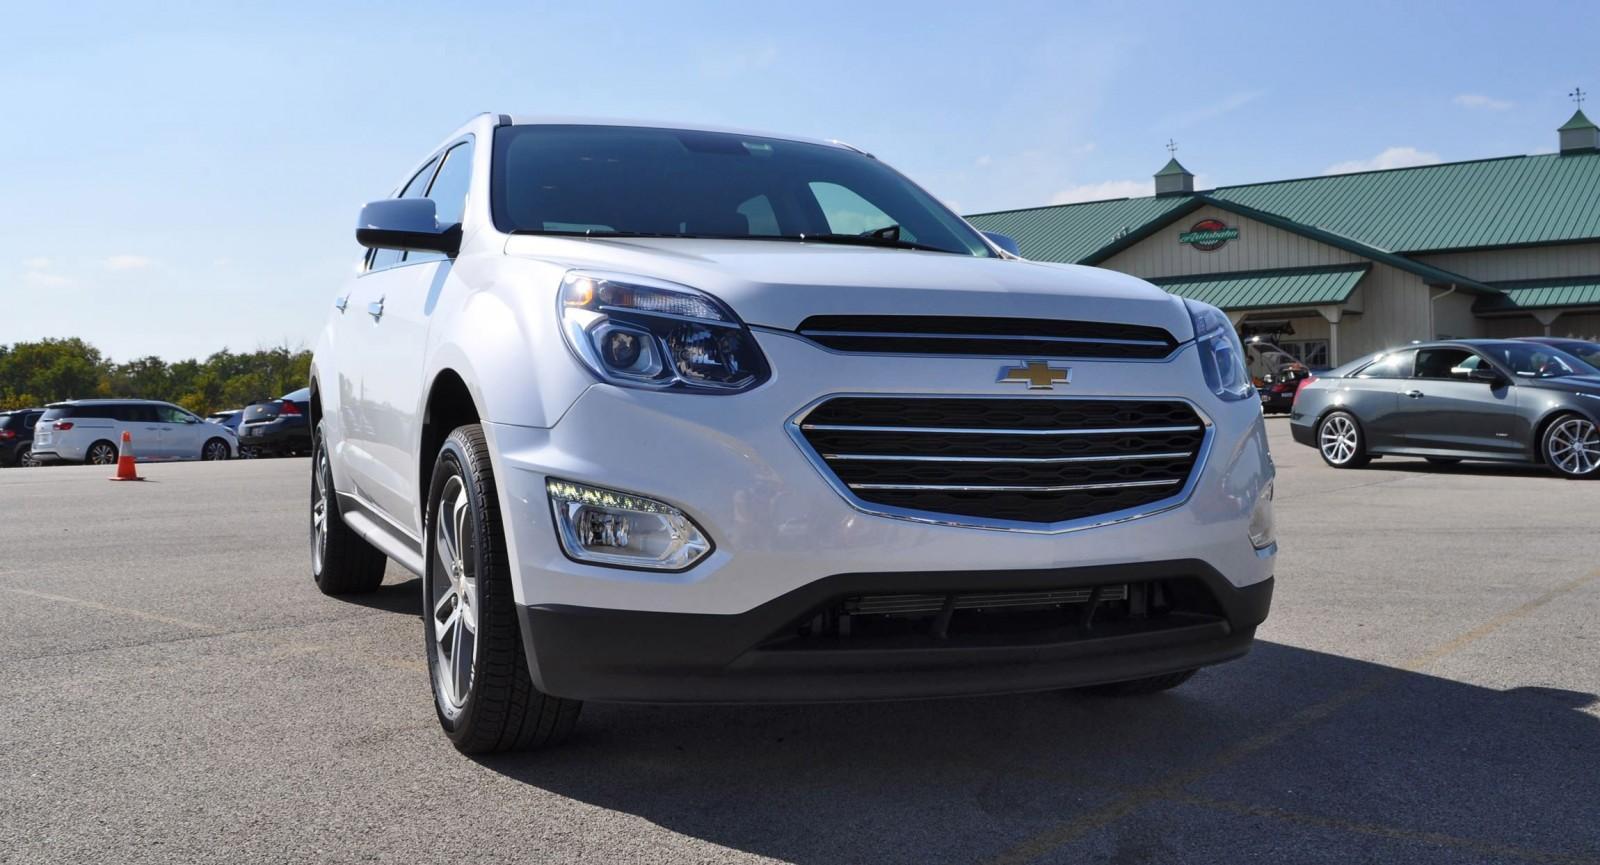 2016 Chevrolet Equinox Ltz >> 2016 Chevrolet EQUINOX